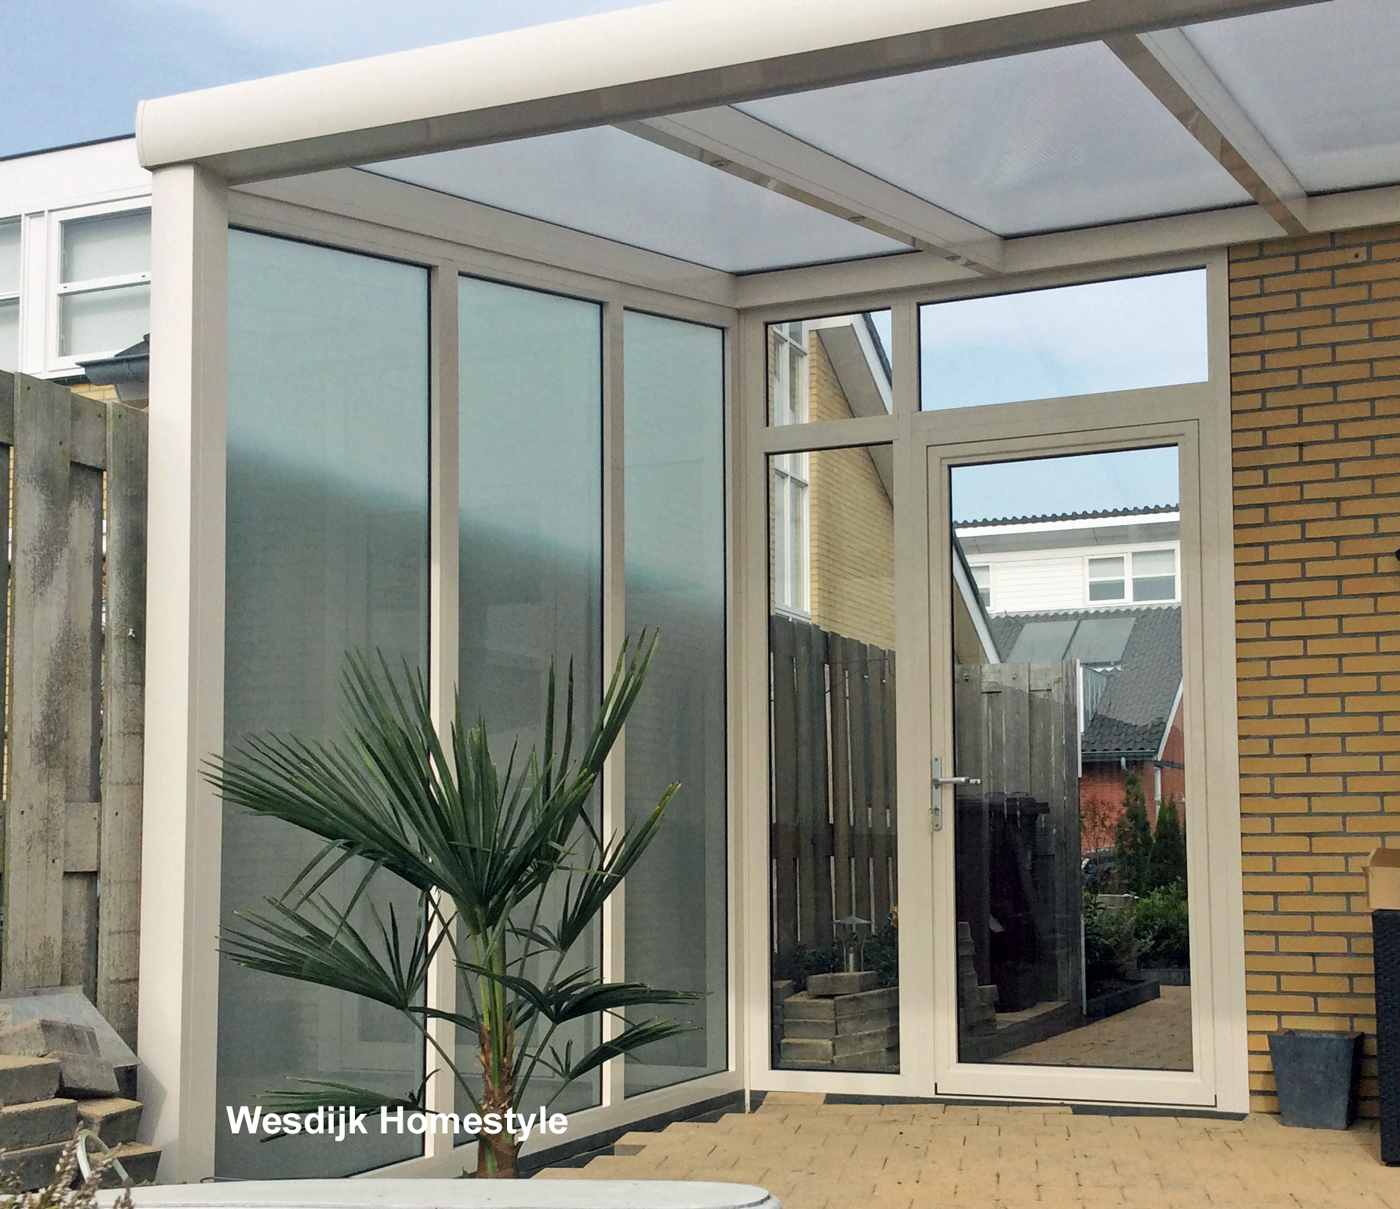 Terrasoverkapping met glas terrasoverkapping glas for Holland deuren service